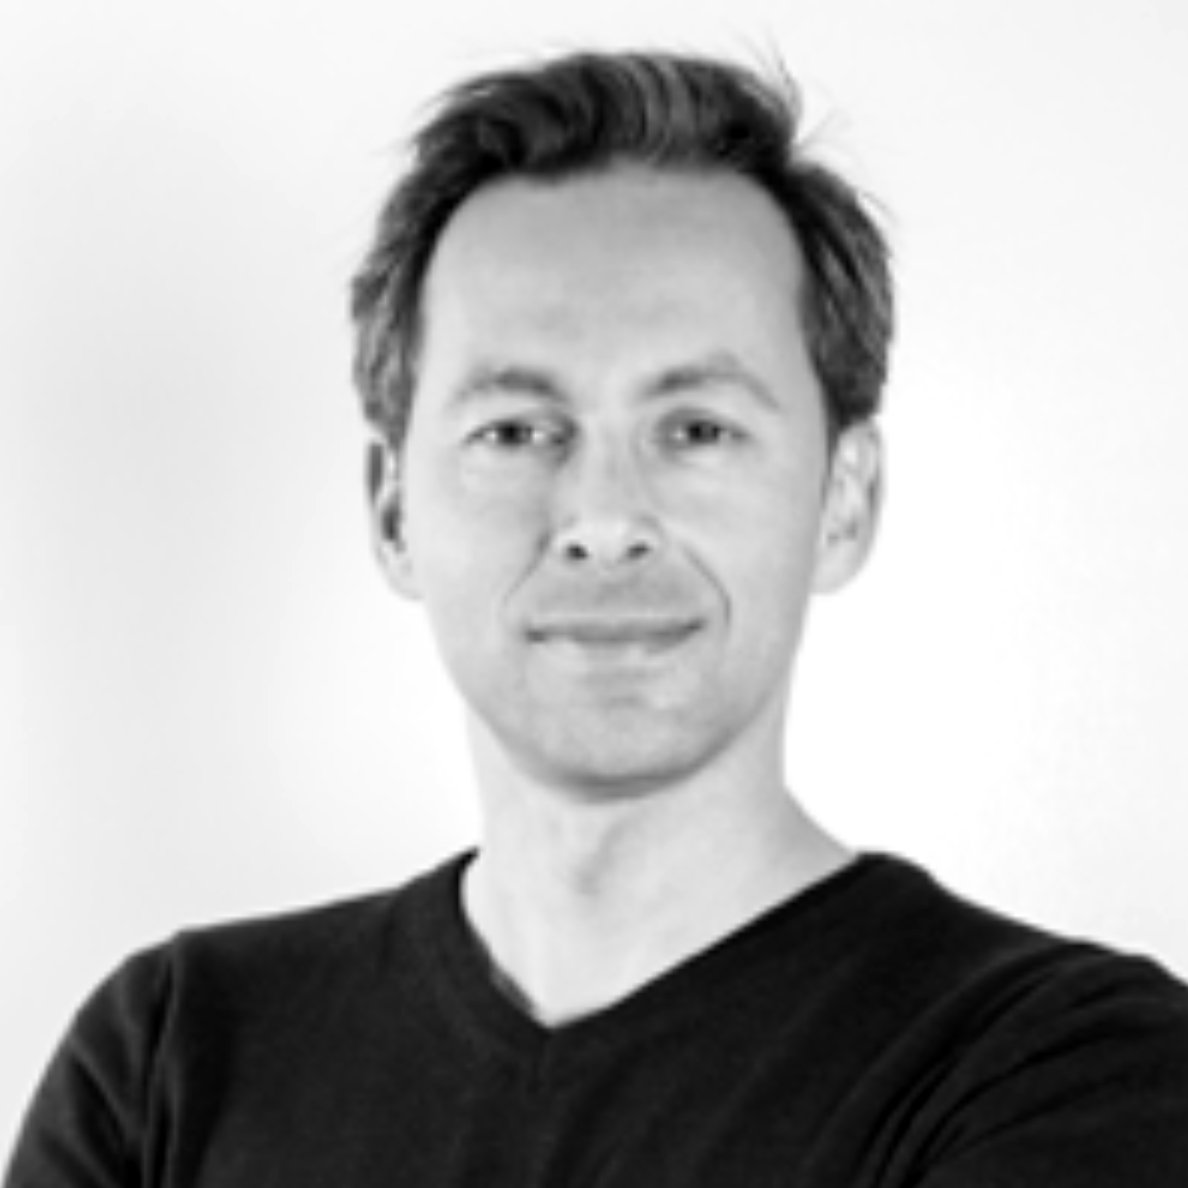 Jens Sievert